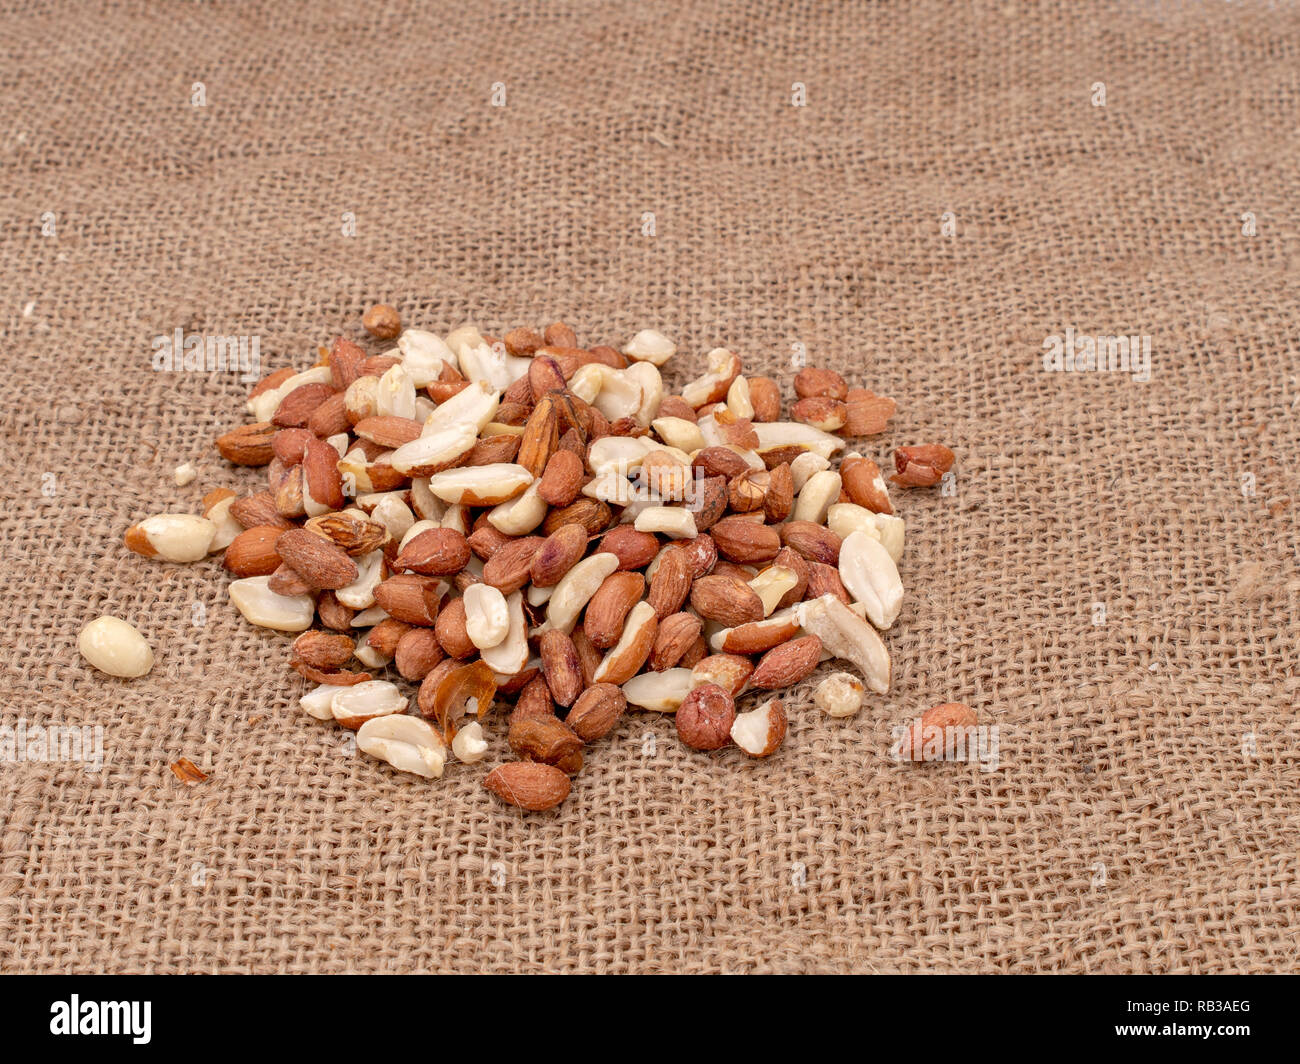 Wild bird food - unsalted peanuts, on hessian. Help feed garden birds wildlife in winter. - Stock Image